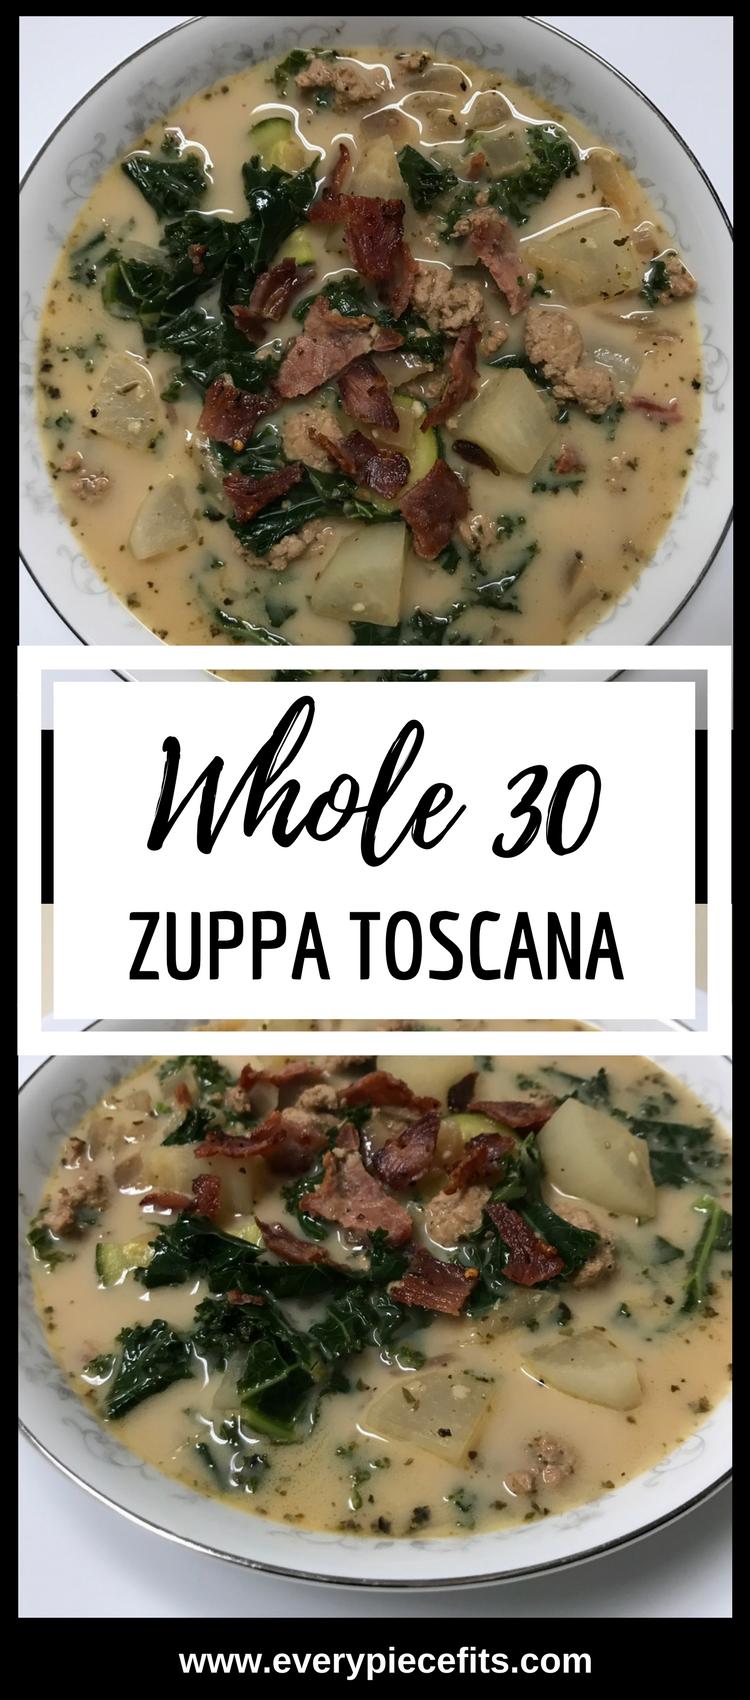 Whole 30 & Paleo Zuppa Toscana.png